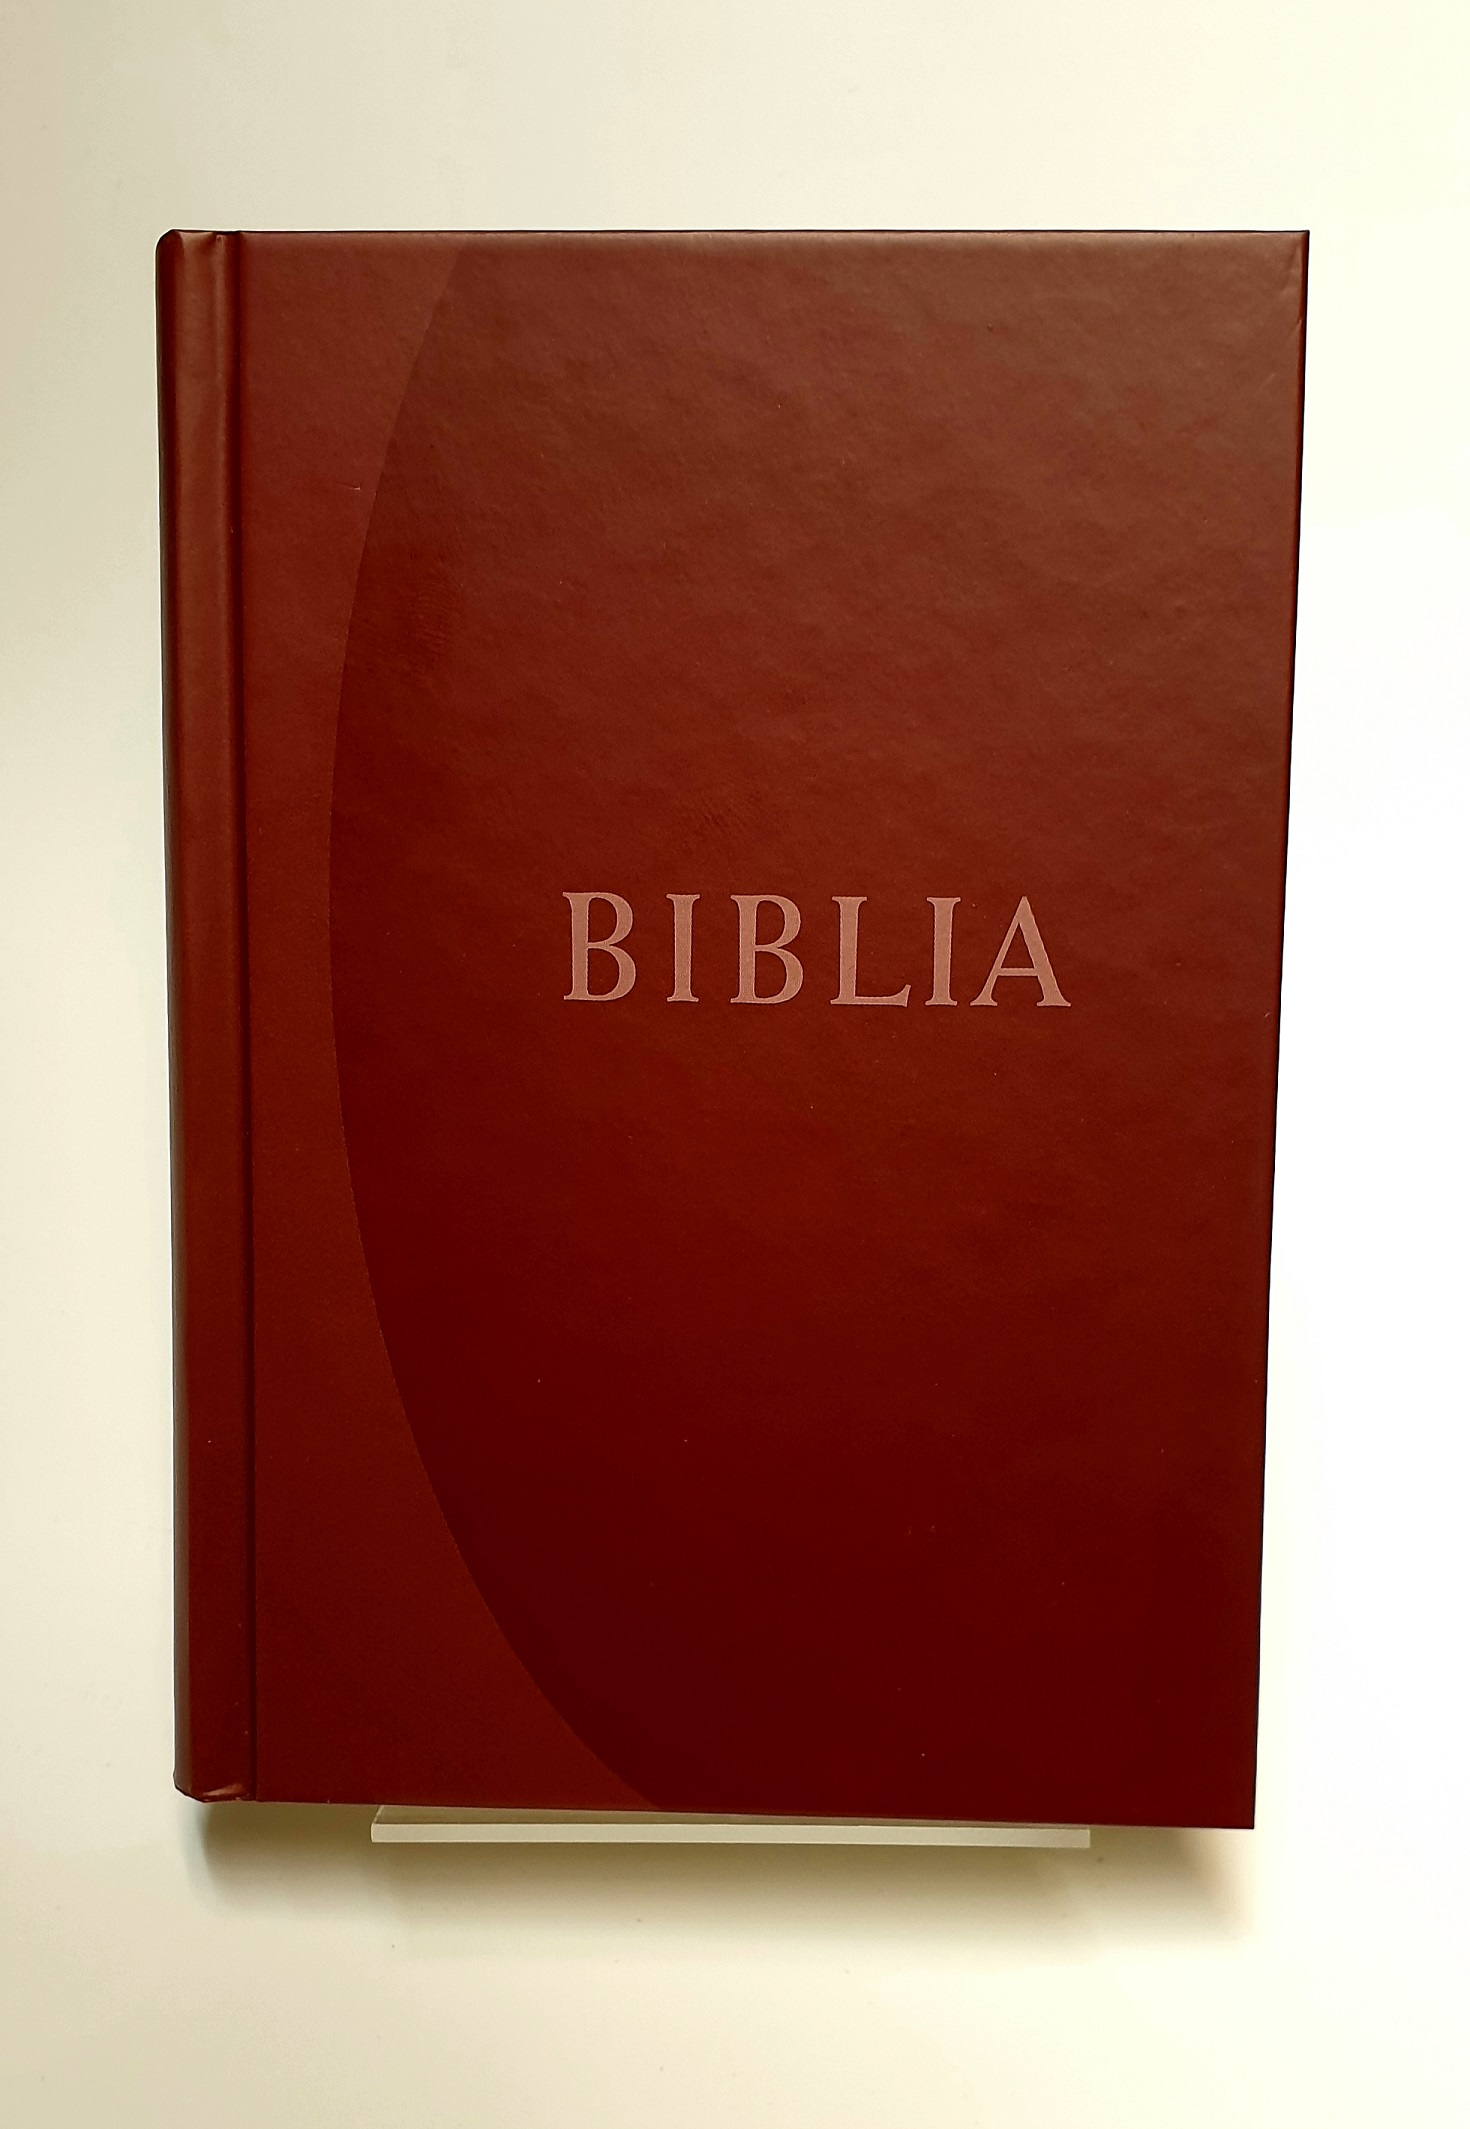 Ungersk bibel artikelnummer 2492 via bibelbutiken.se